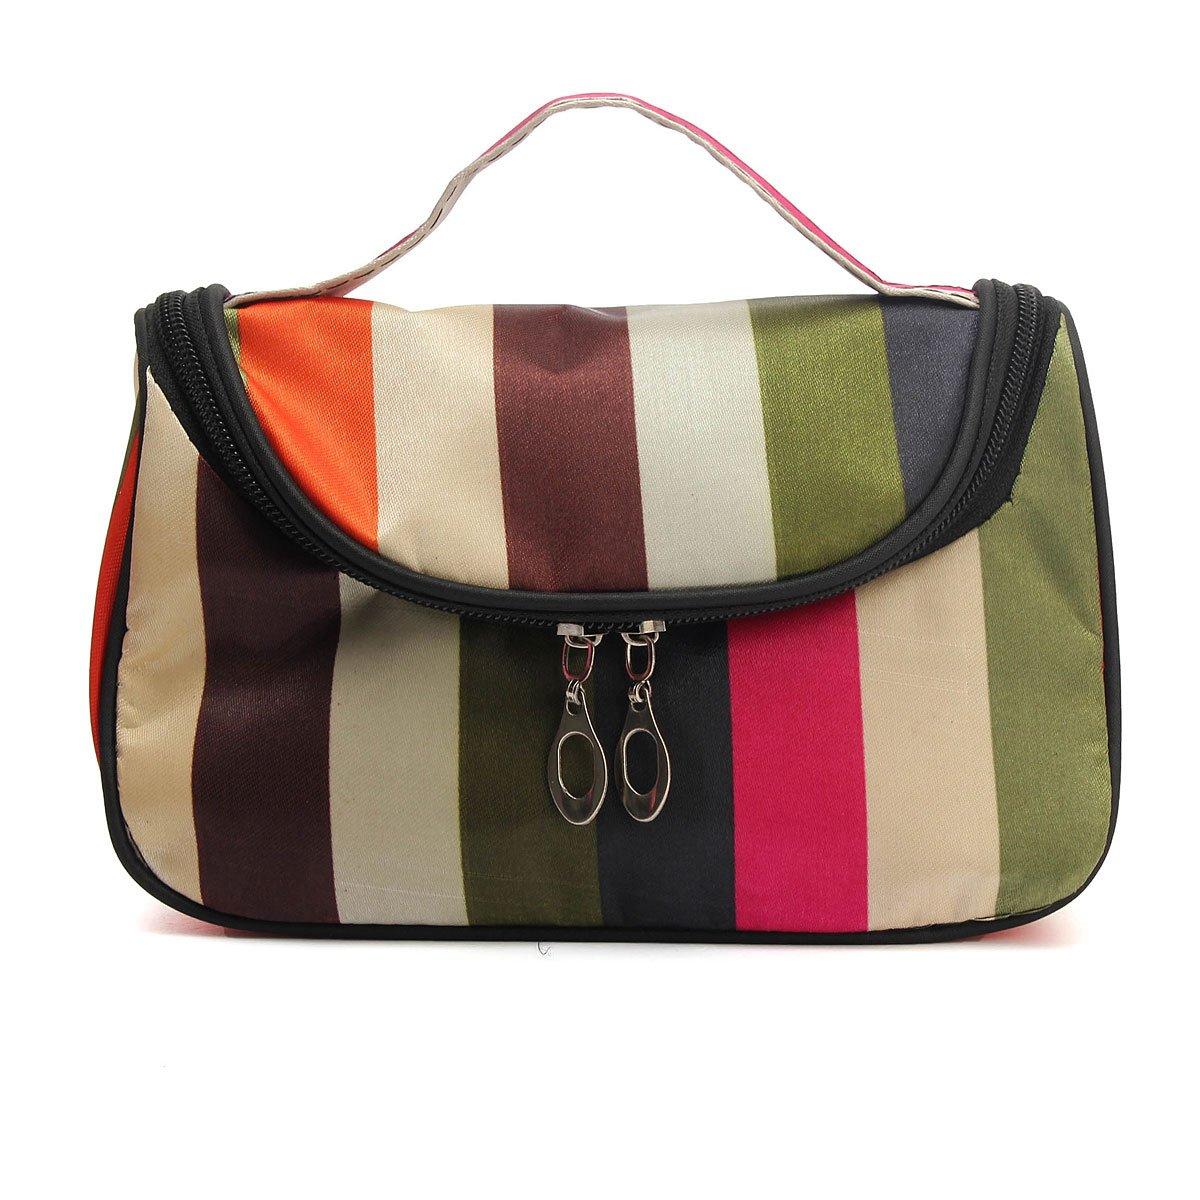 FGGS 5 color Hot Handbag Pouch Bag in Bag Organiser Insert Organizer Tidy Travel Cosmetic Pocket Makeup Bag women lady travel insert handbag organiser purse large liner organizer tidy bag